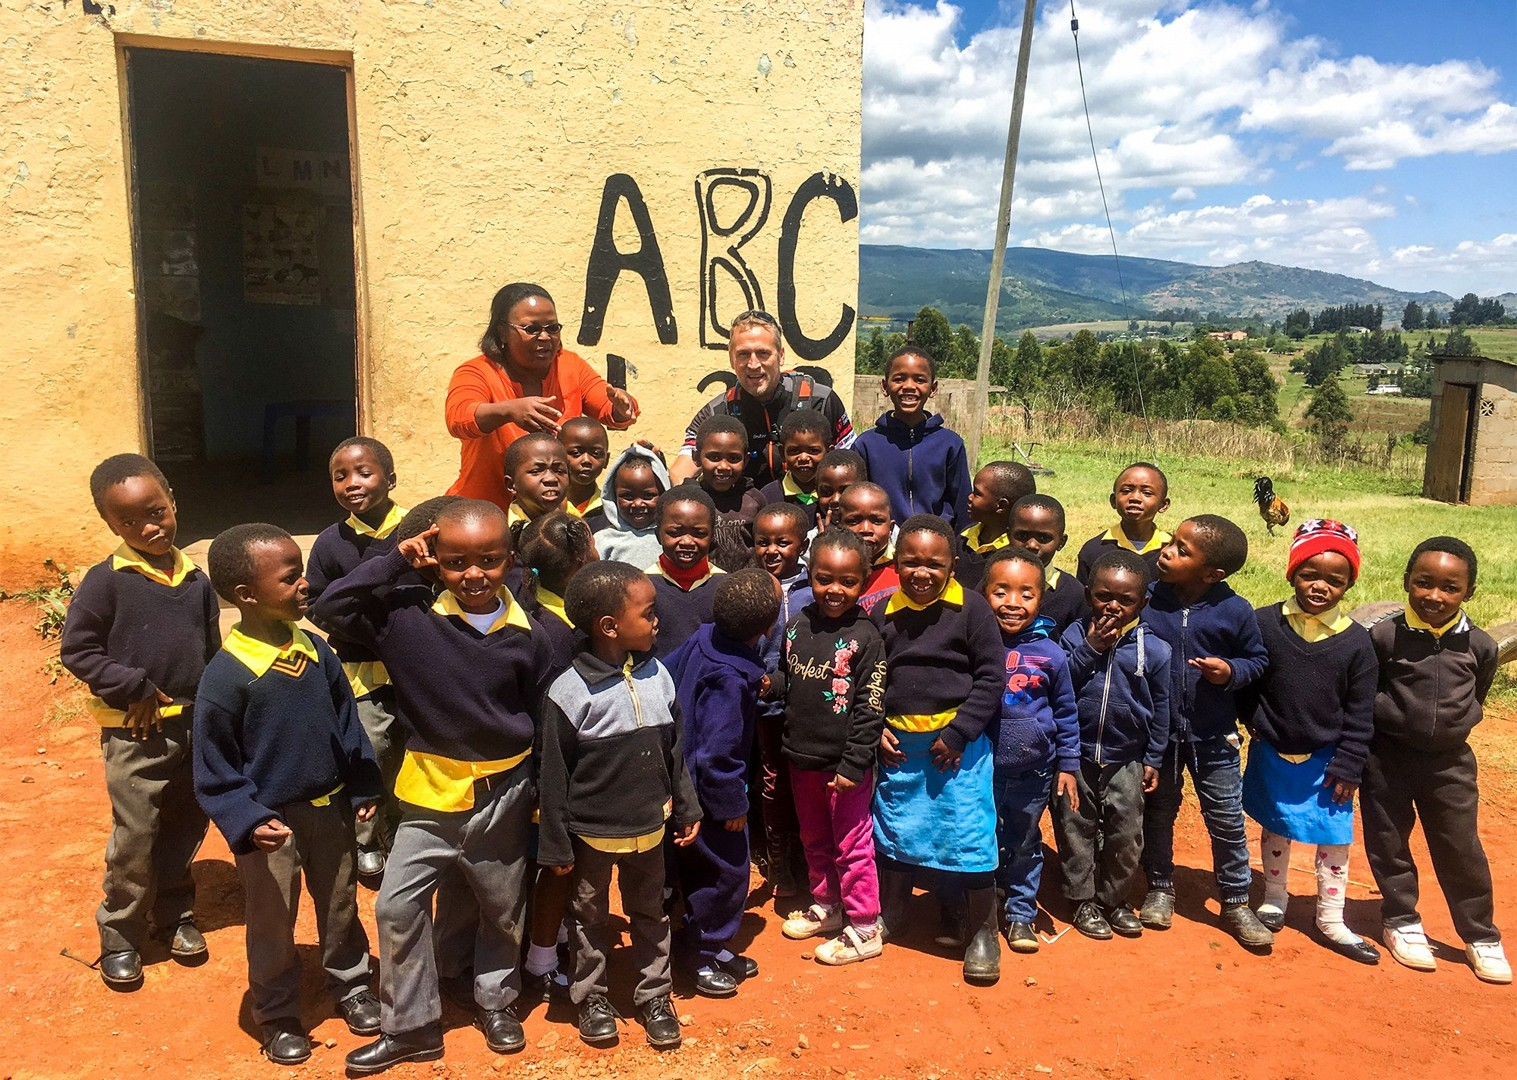 rgfdgfg6.jpg - Eswatini (Swaziland) - Cycling Safari - Cycling Adventures